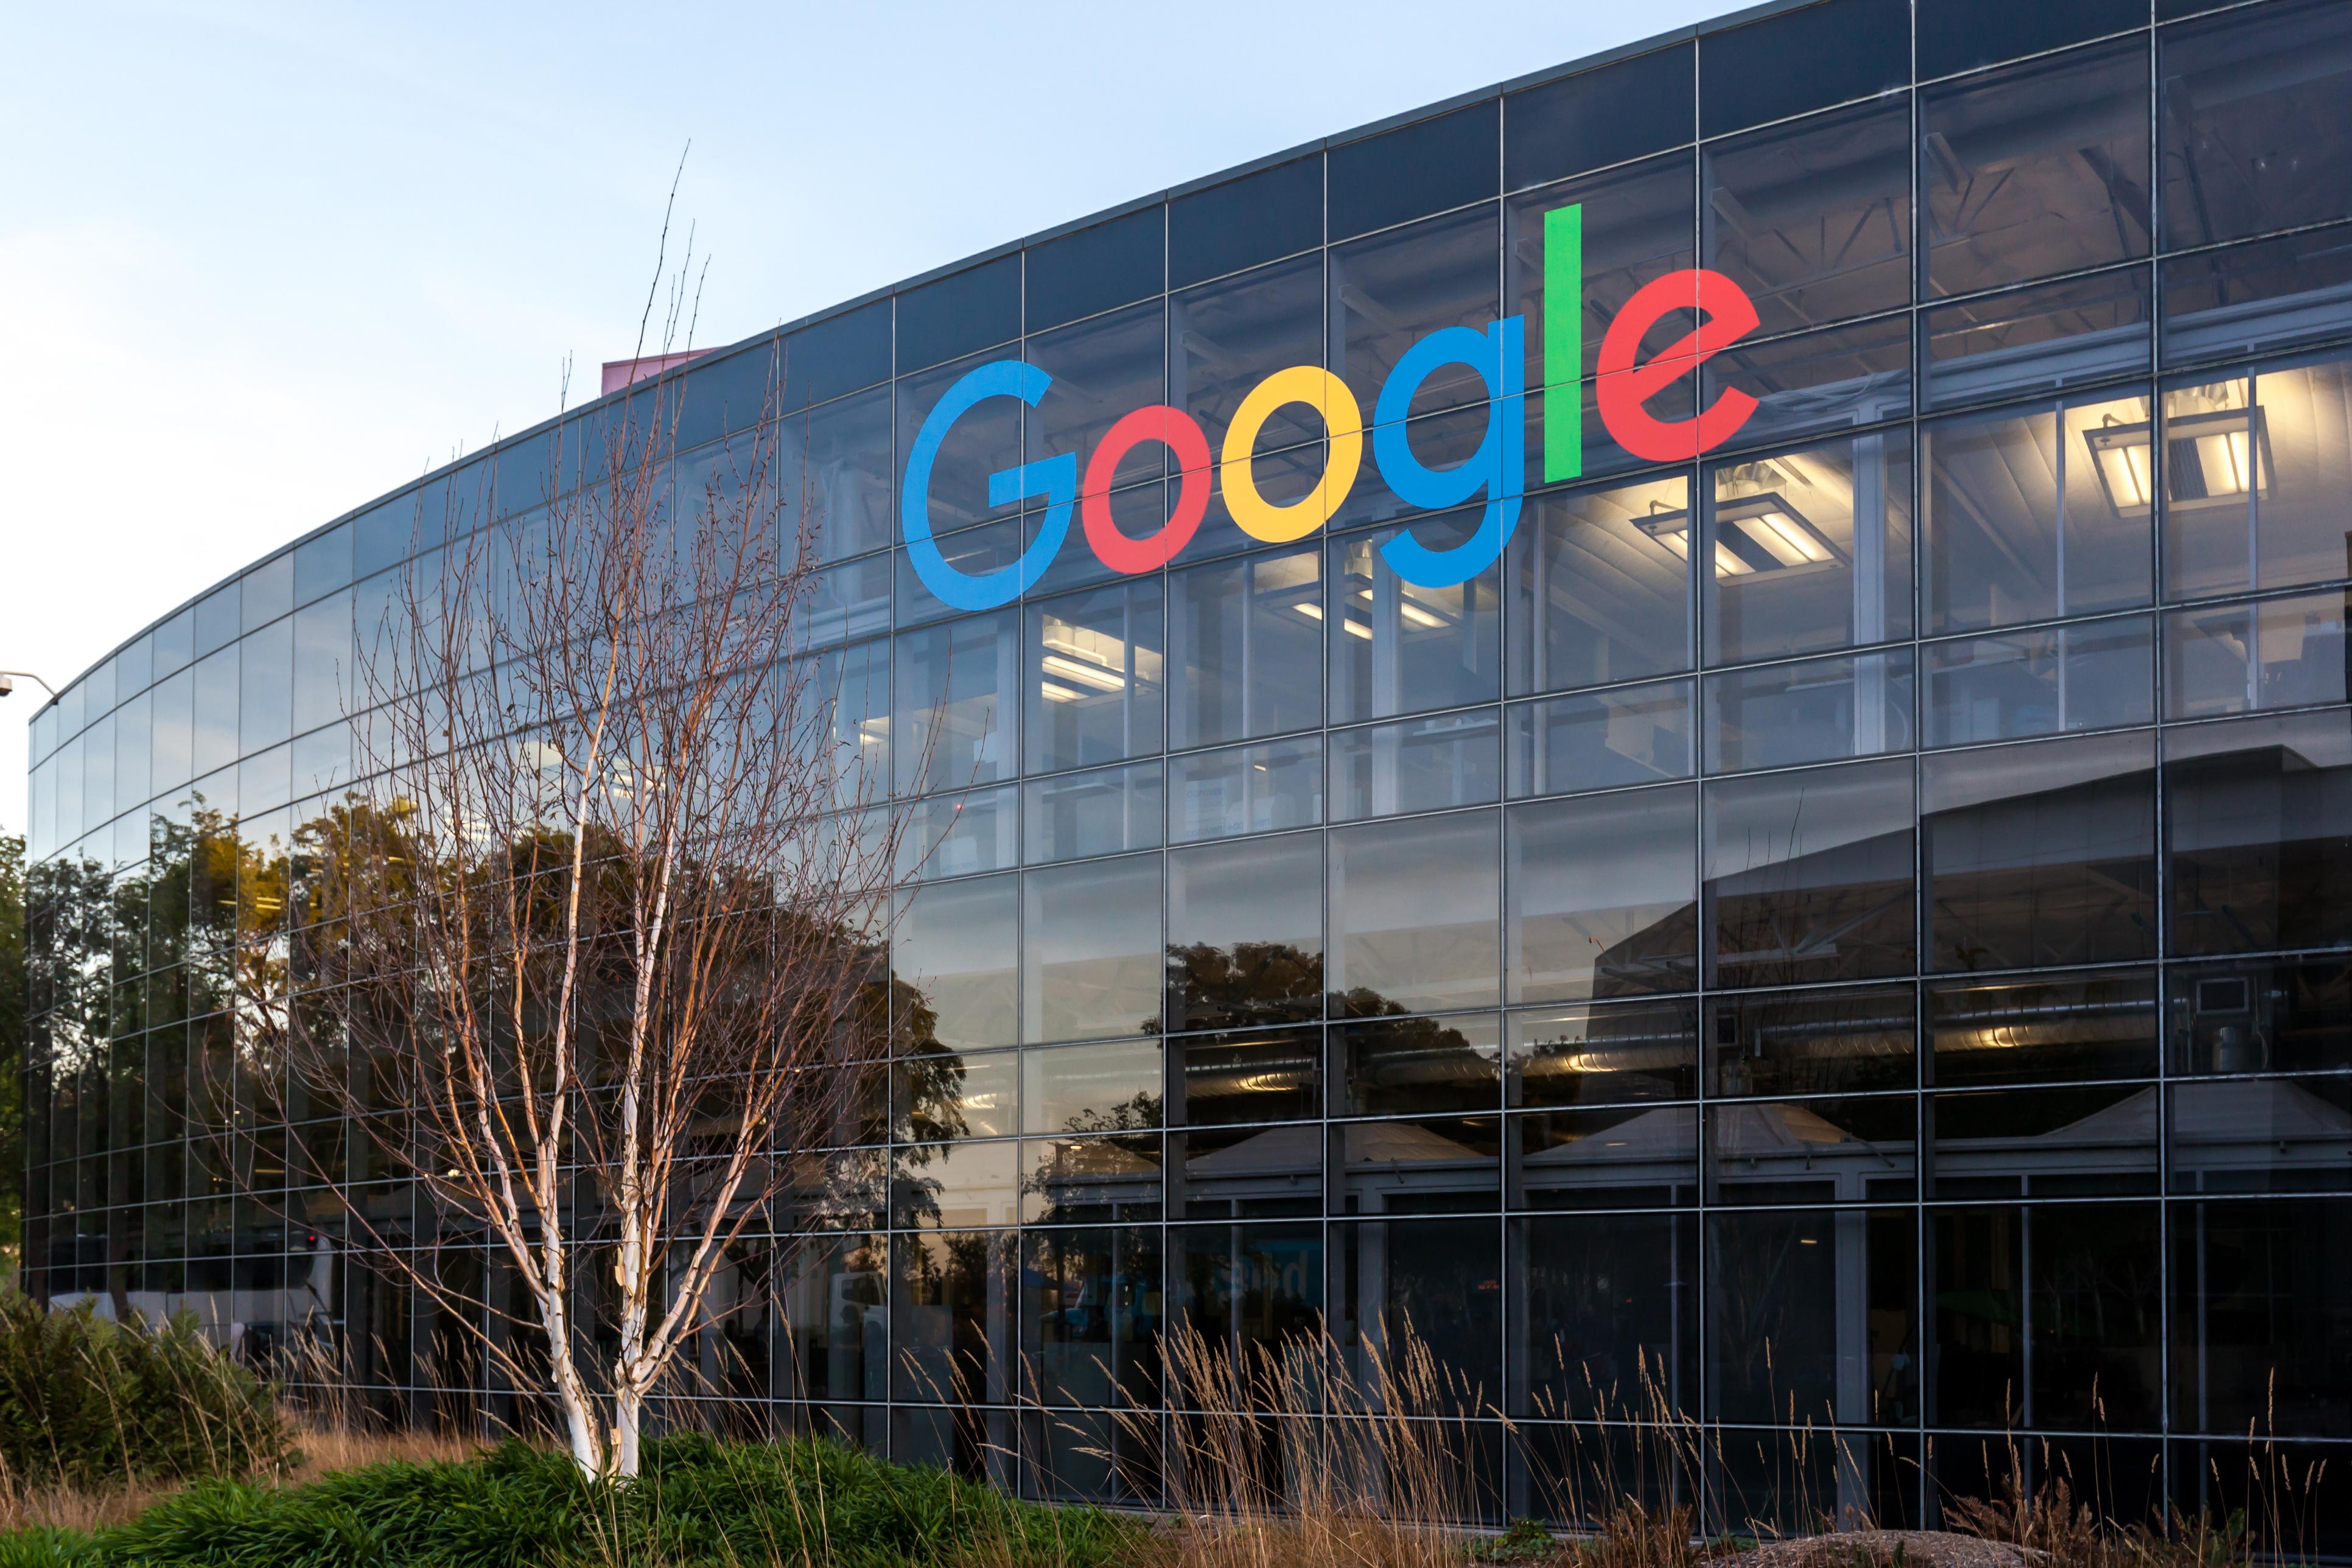 Webjet hits back at factual inaccuracies of Googles